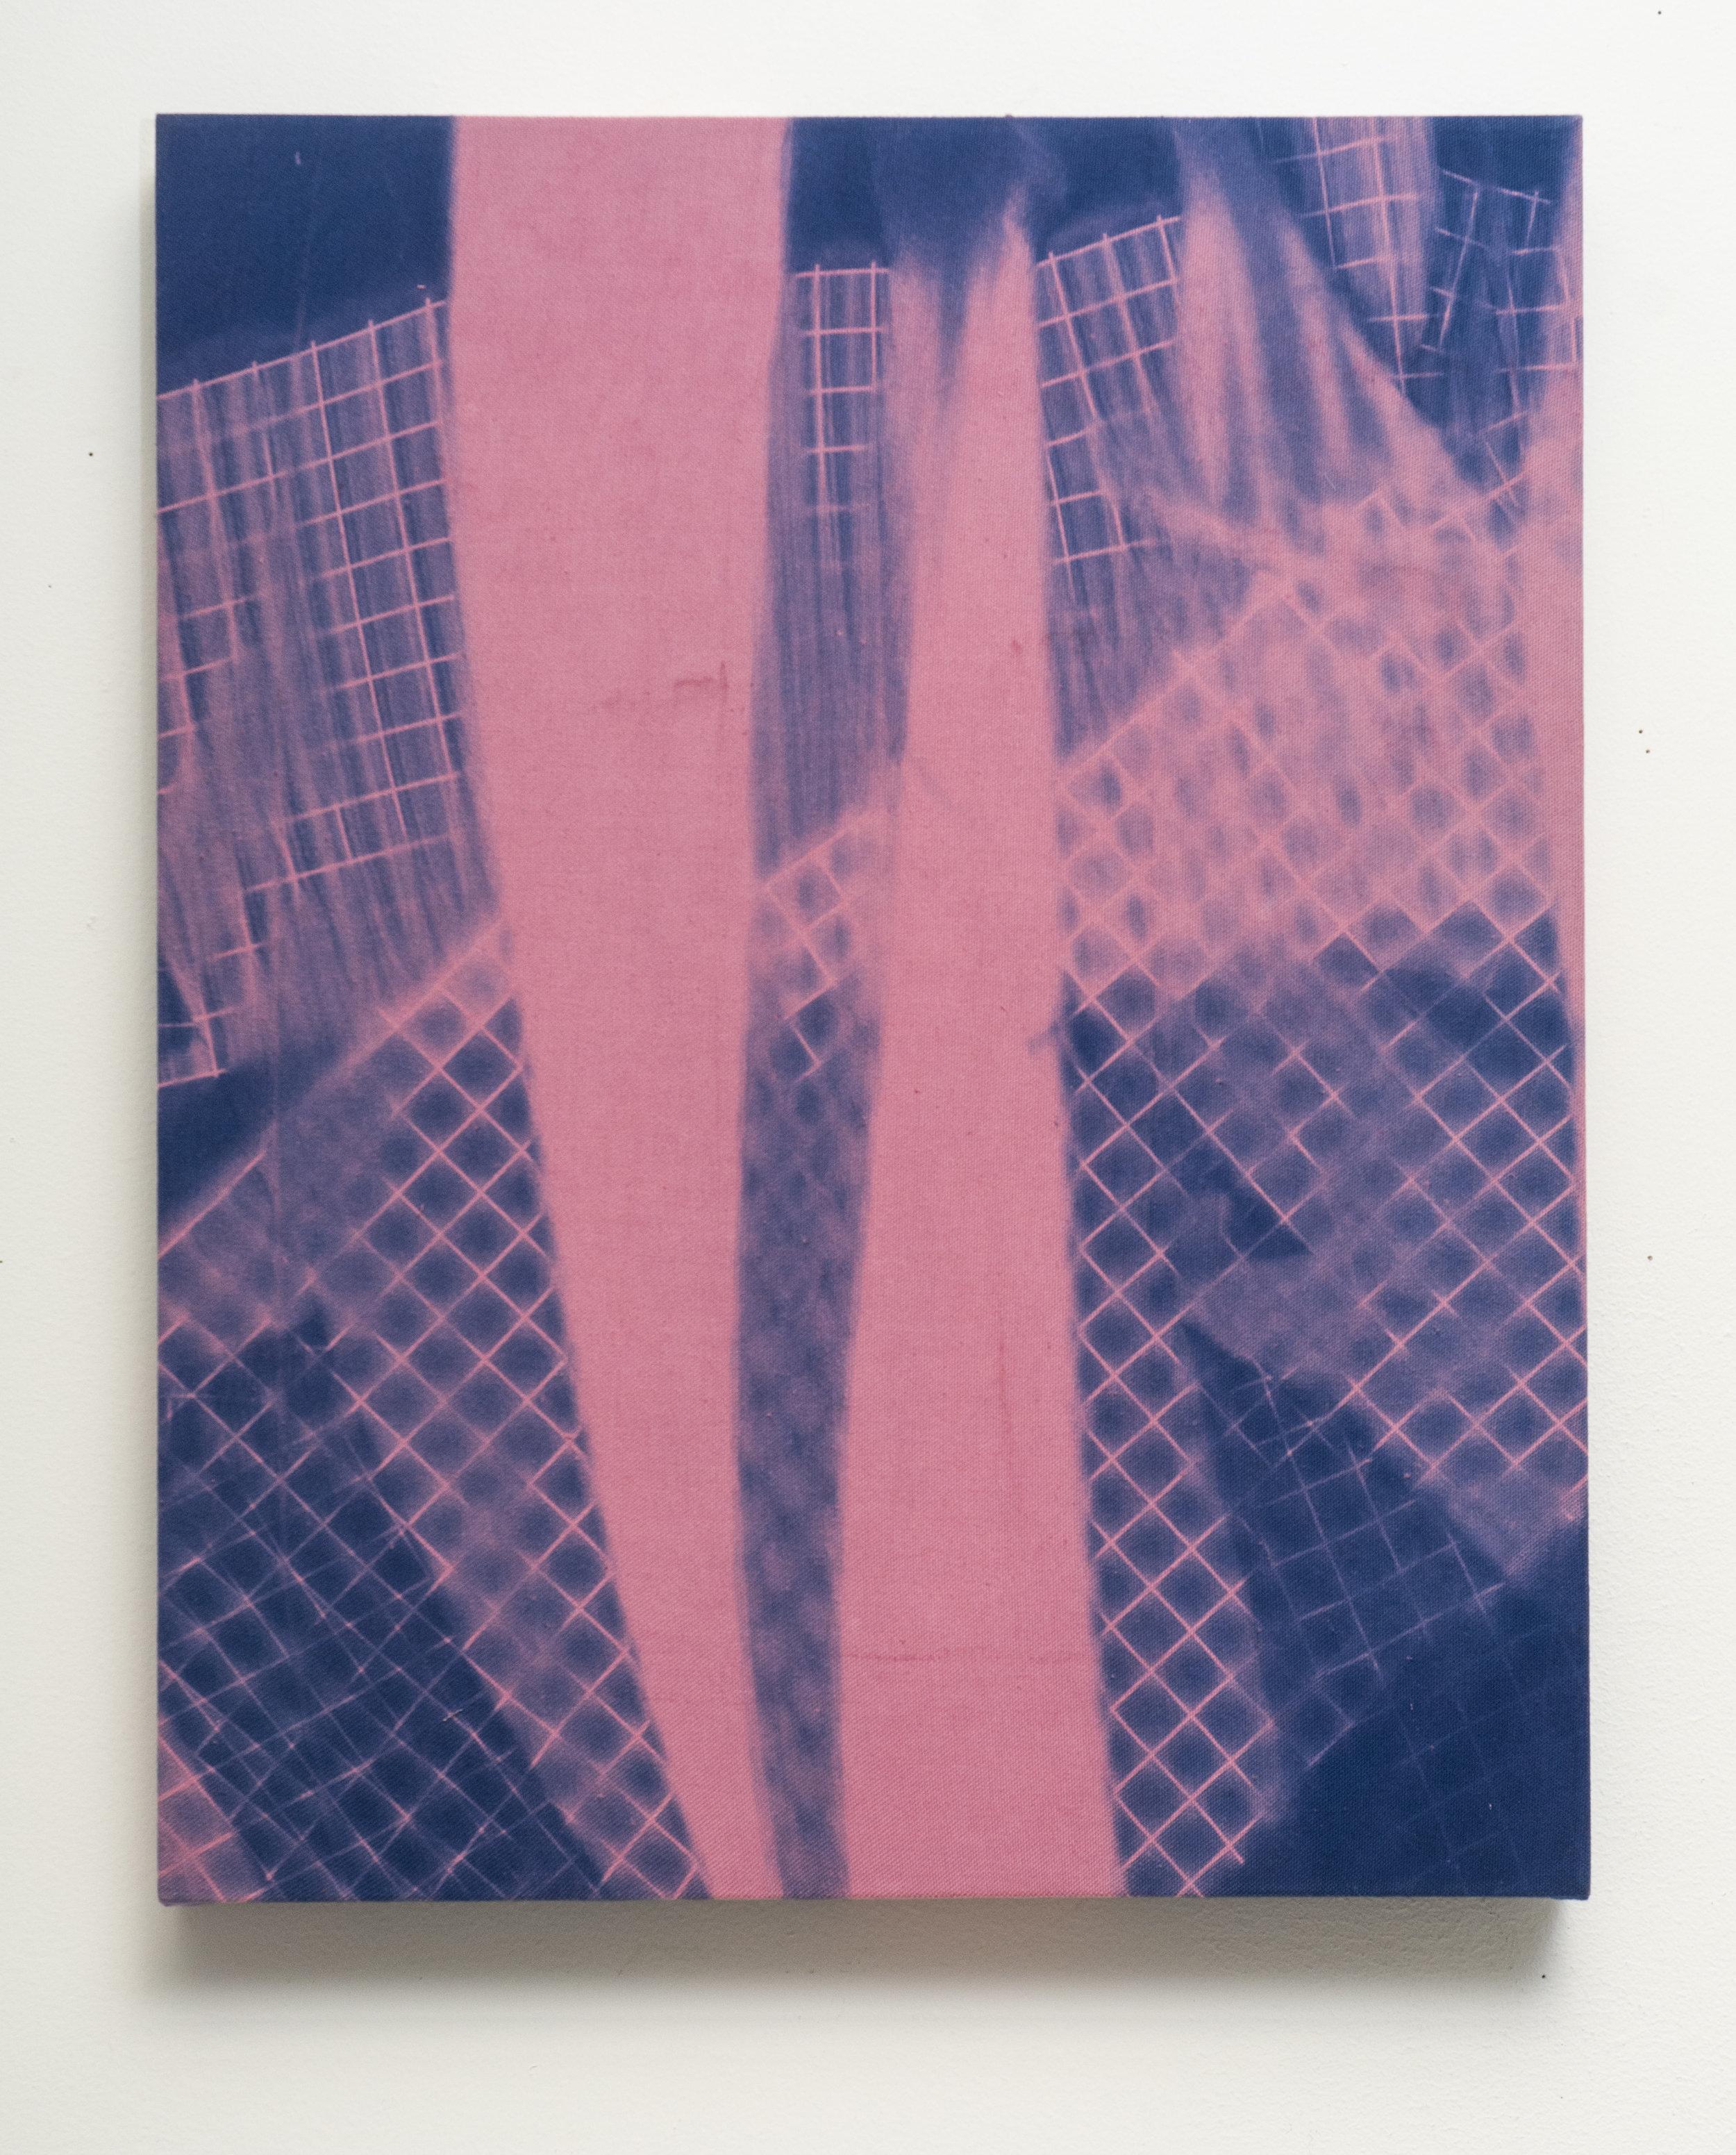 7Cyanotypes_White Fluorescent Light Diffuser, Triple Variant 1 (Pink)_16x20%22-.jpg